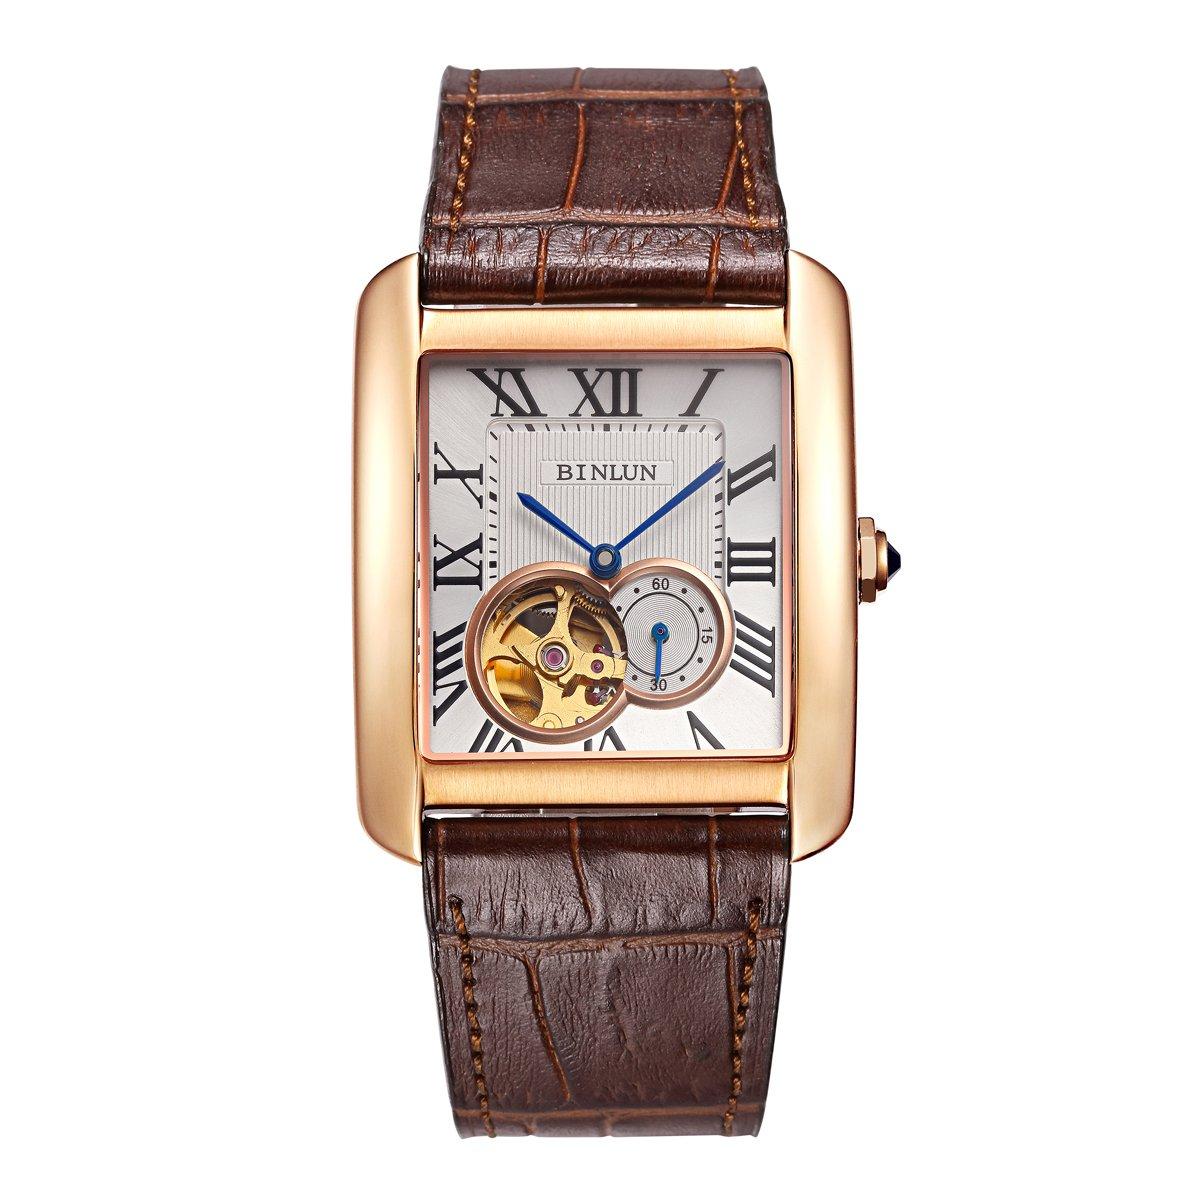 Binlun Men's Rectangle Shape Gold-Plating Business Mechanical Self-Winding Watch Brown Leather Band by BINLUN